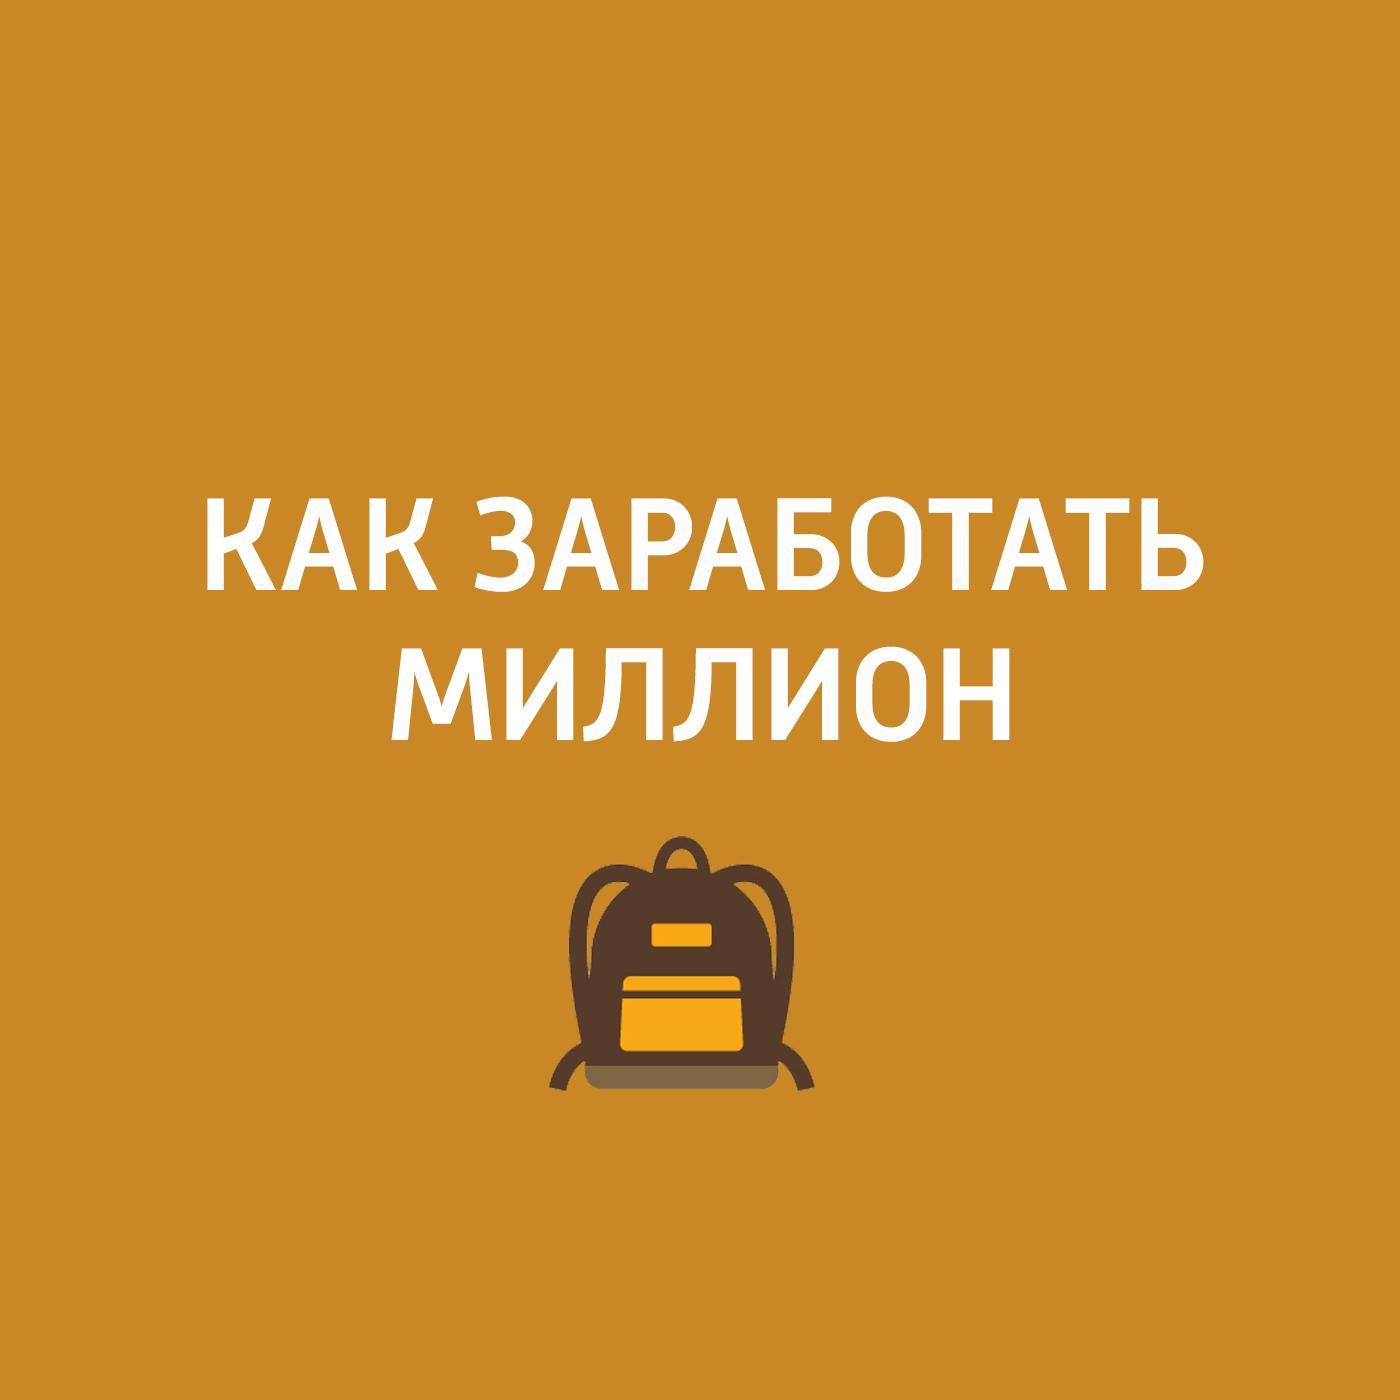 Творческий коллектив шоу «Сергей Стиллавин и его друзья» Triton Bikes